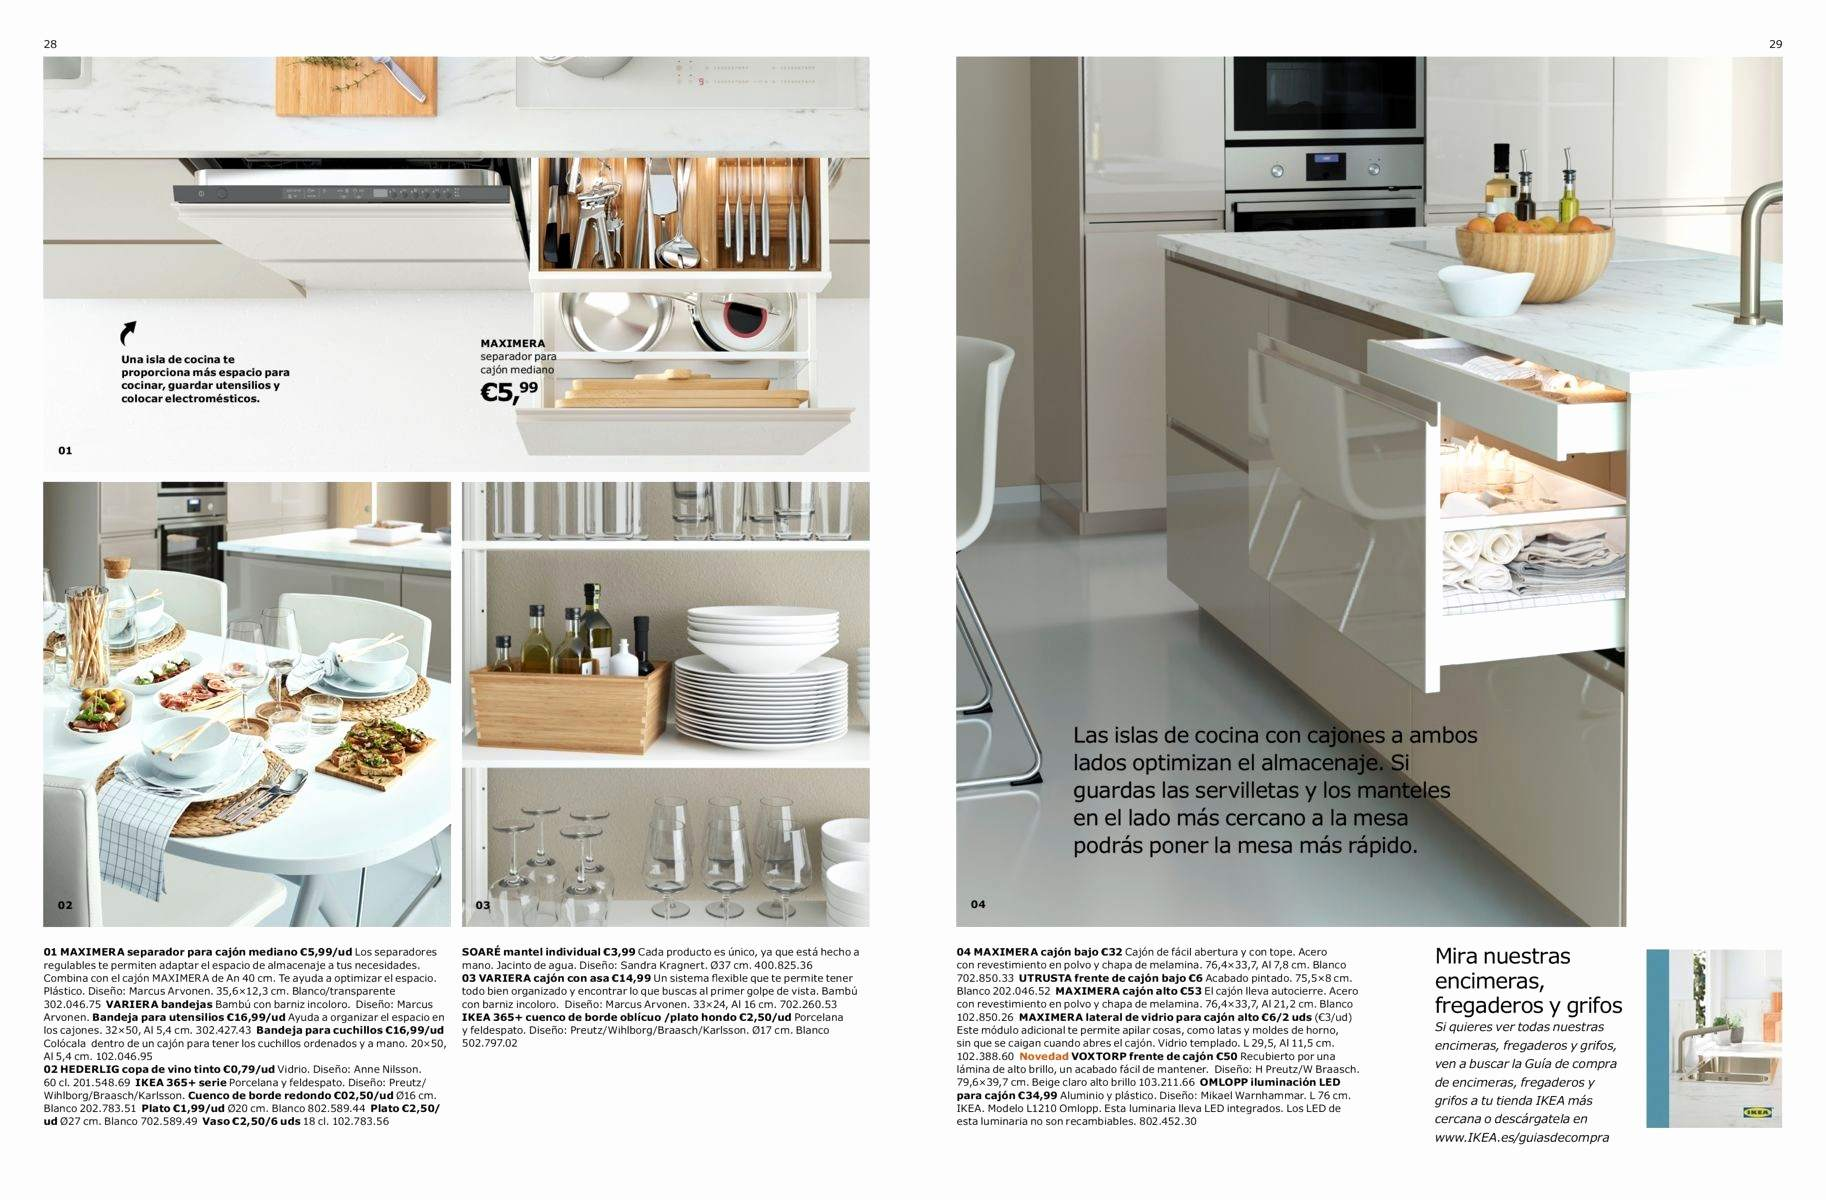 Planificateur Cuisine Ikea Nouveau Galerie Ikea Cuisine Plan Travail Luxe Planificateur Cuisine Ikea Unique